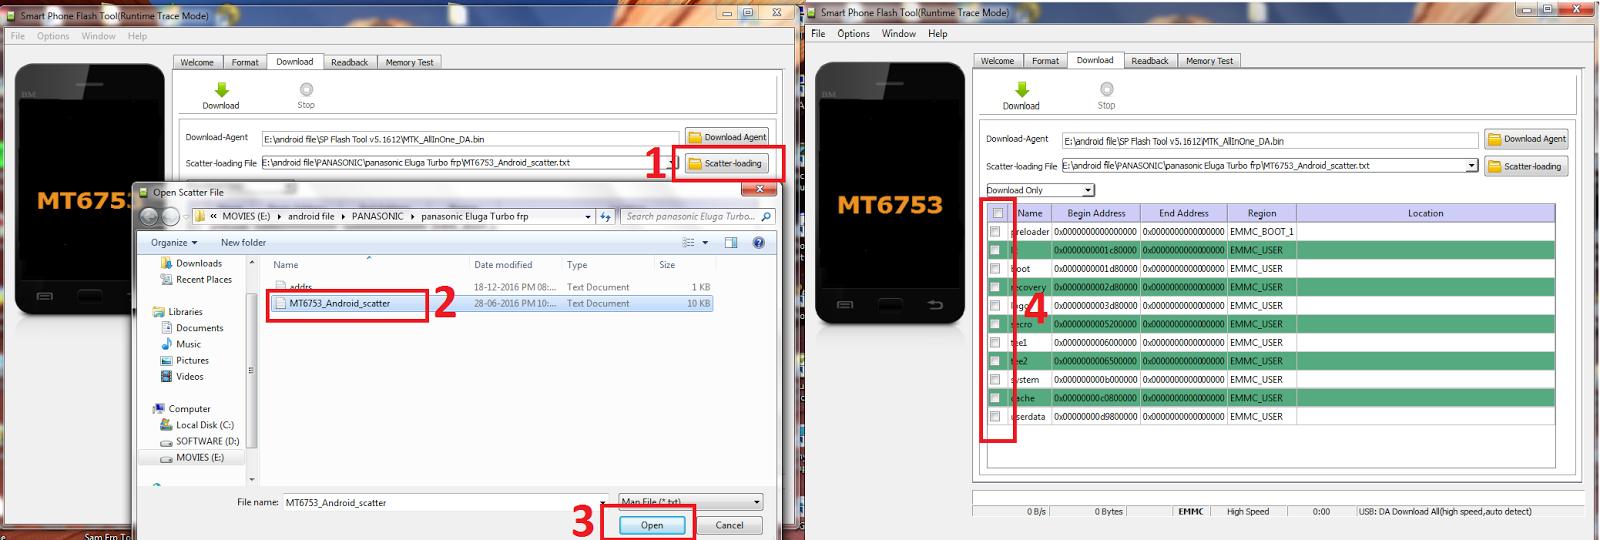 Panasonic Eluga Turbo Frp Unlock tested solution - MOBILE